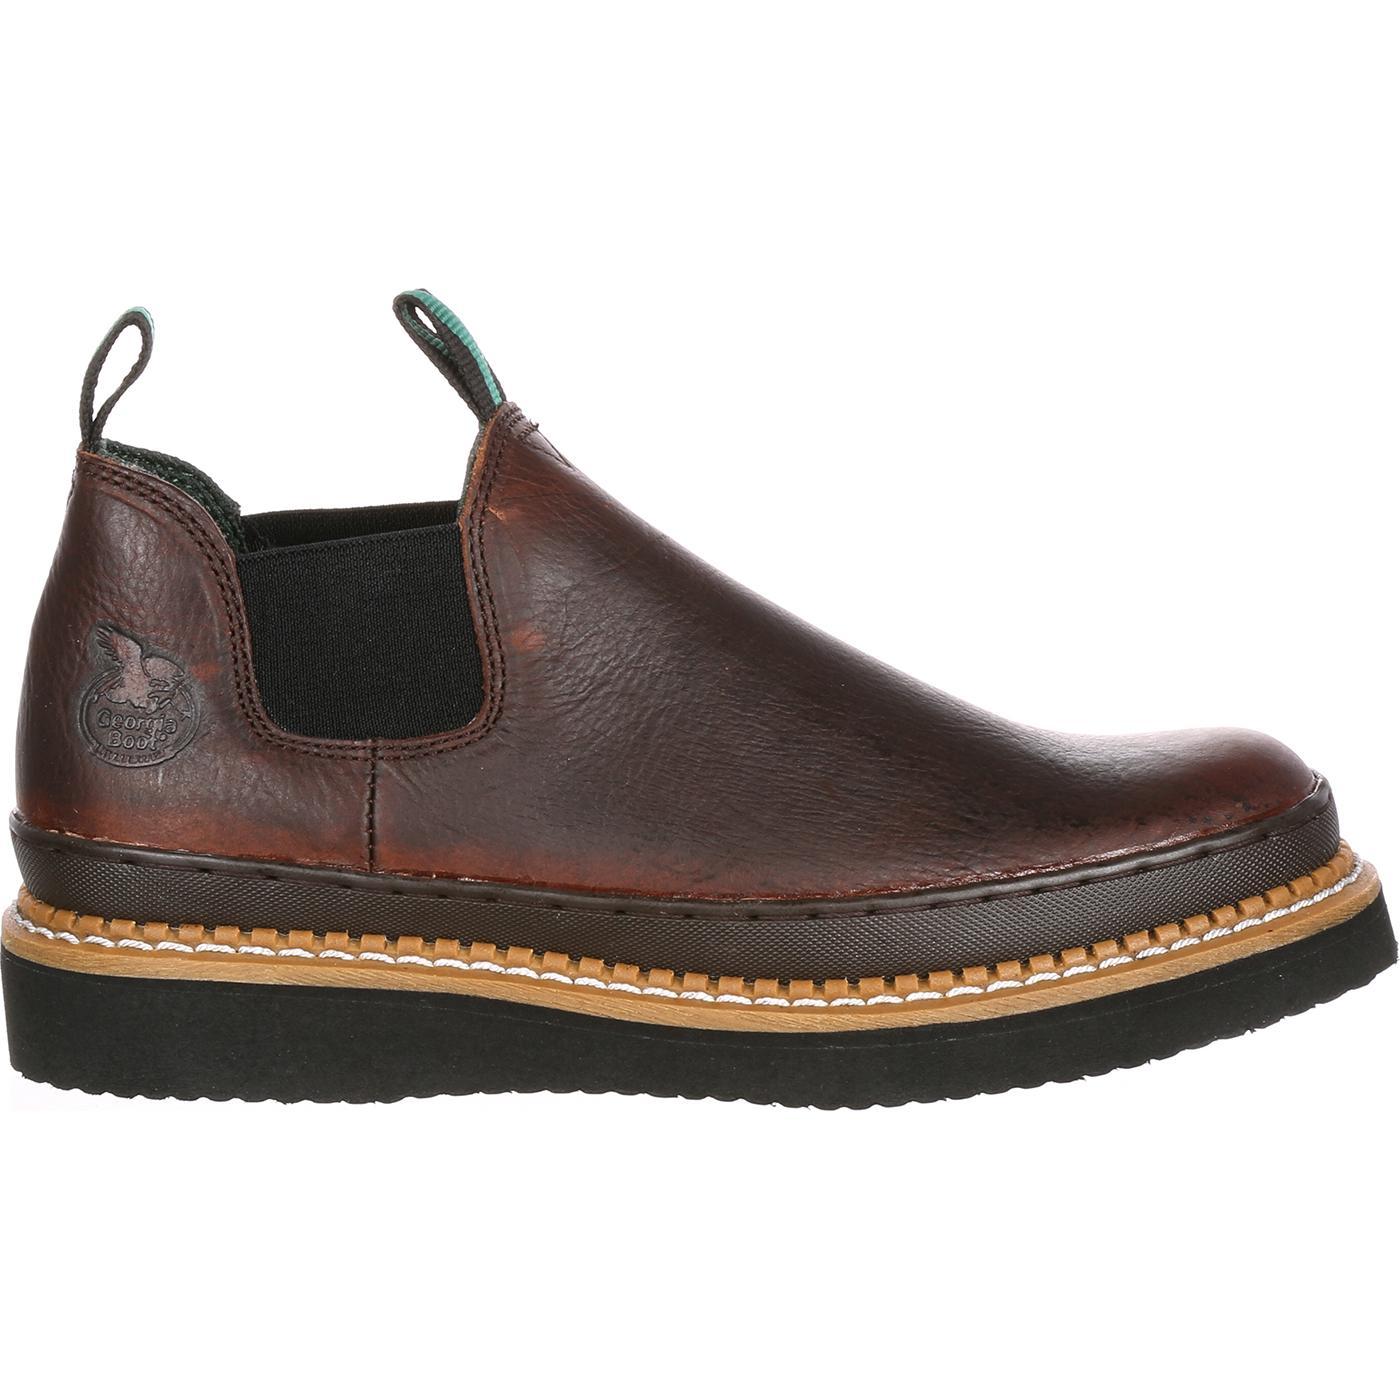 24360043f59e Men's Brown Romeo Slip On Work Shoe by Georgia Boot #GR274